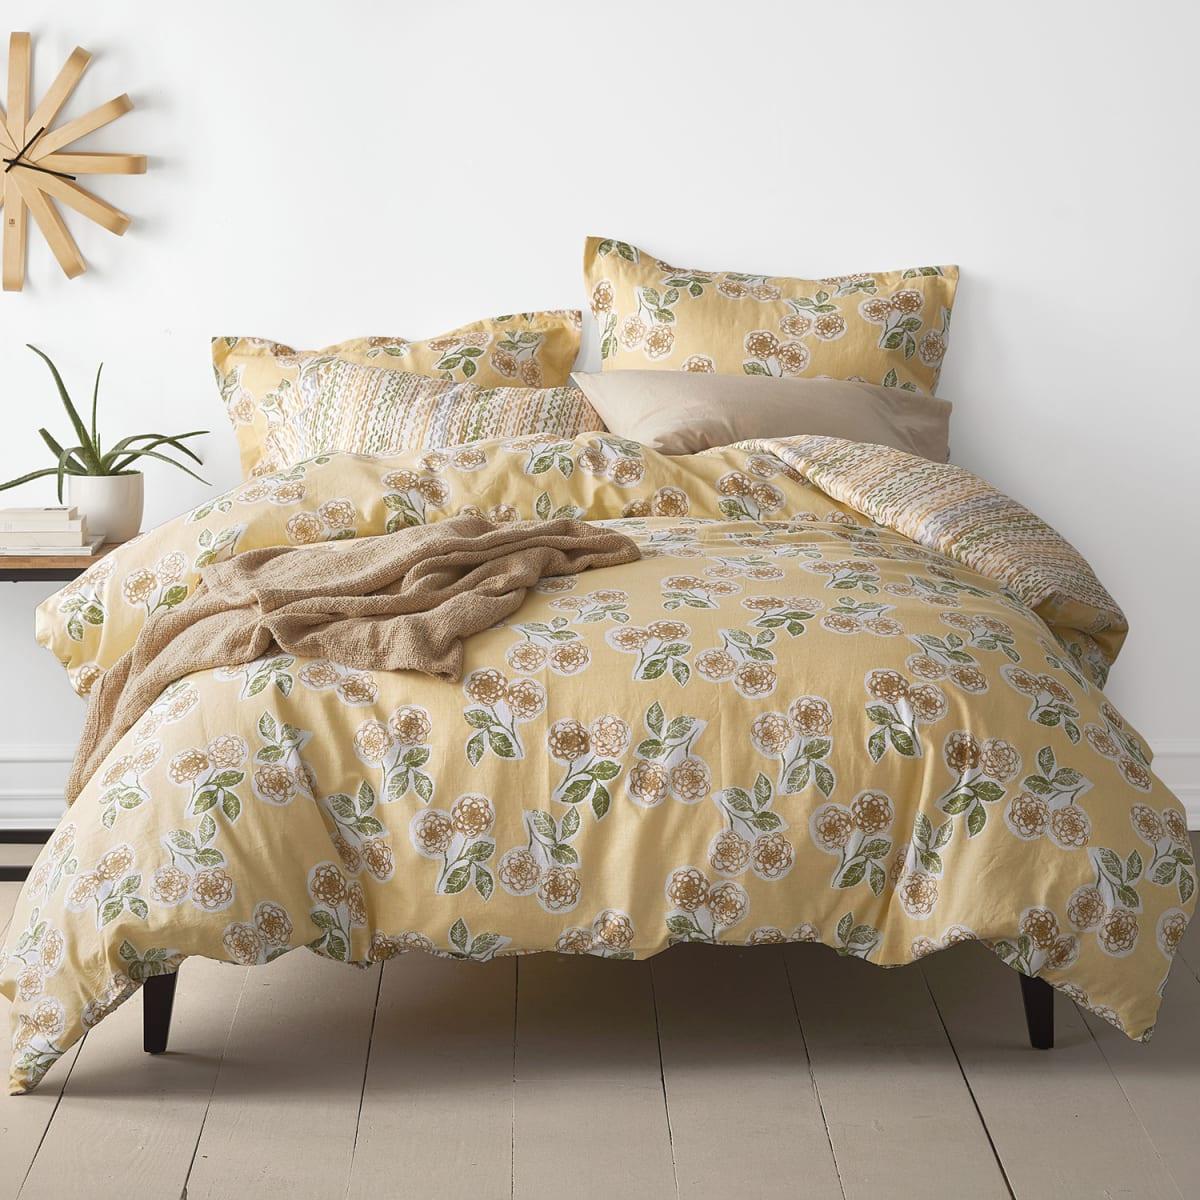 Ashby Floral Stripe Linen Cotton Duvet Cover The Company Store